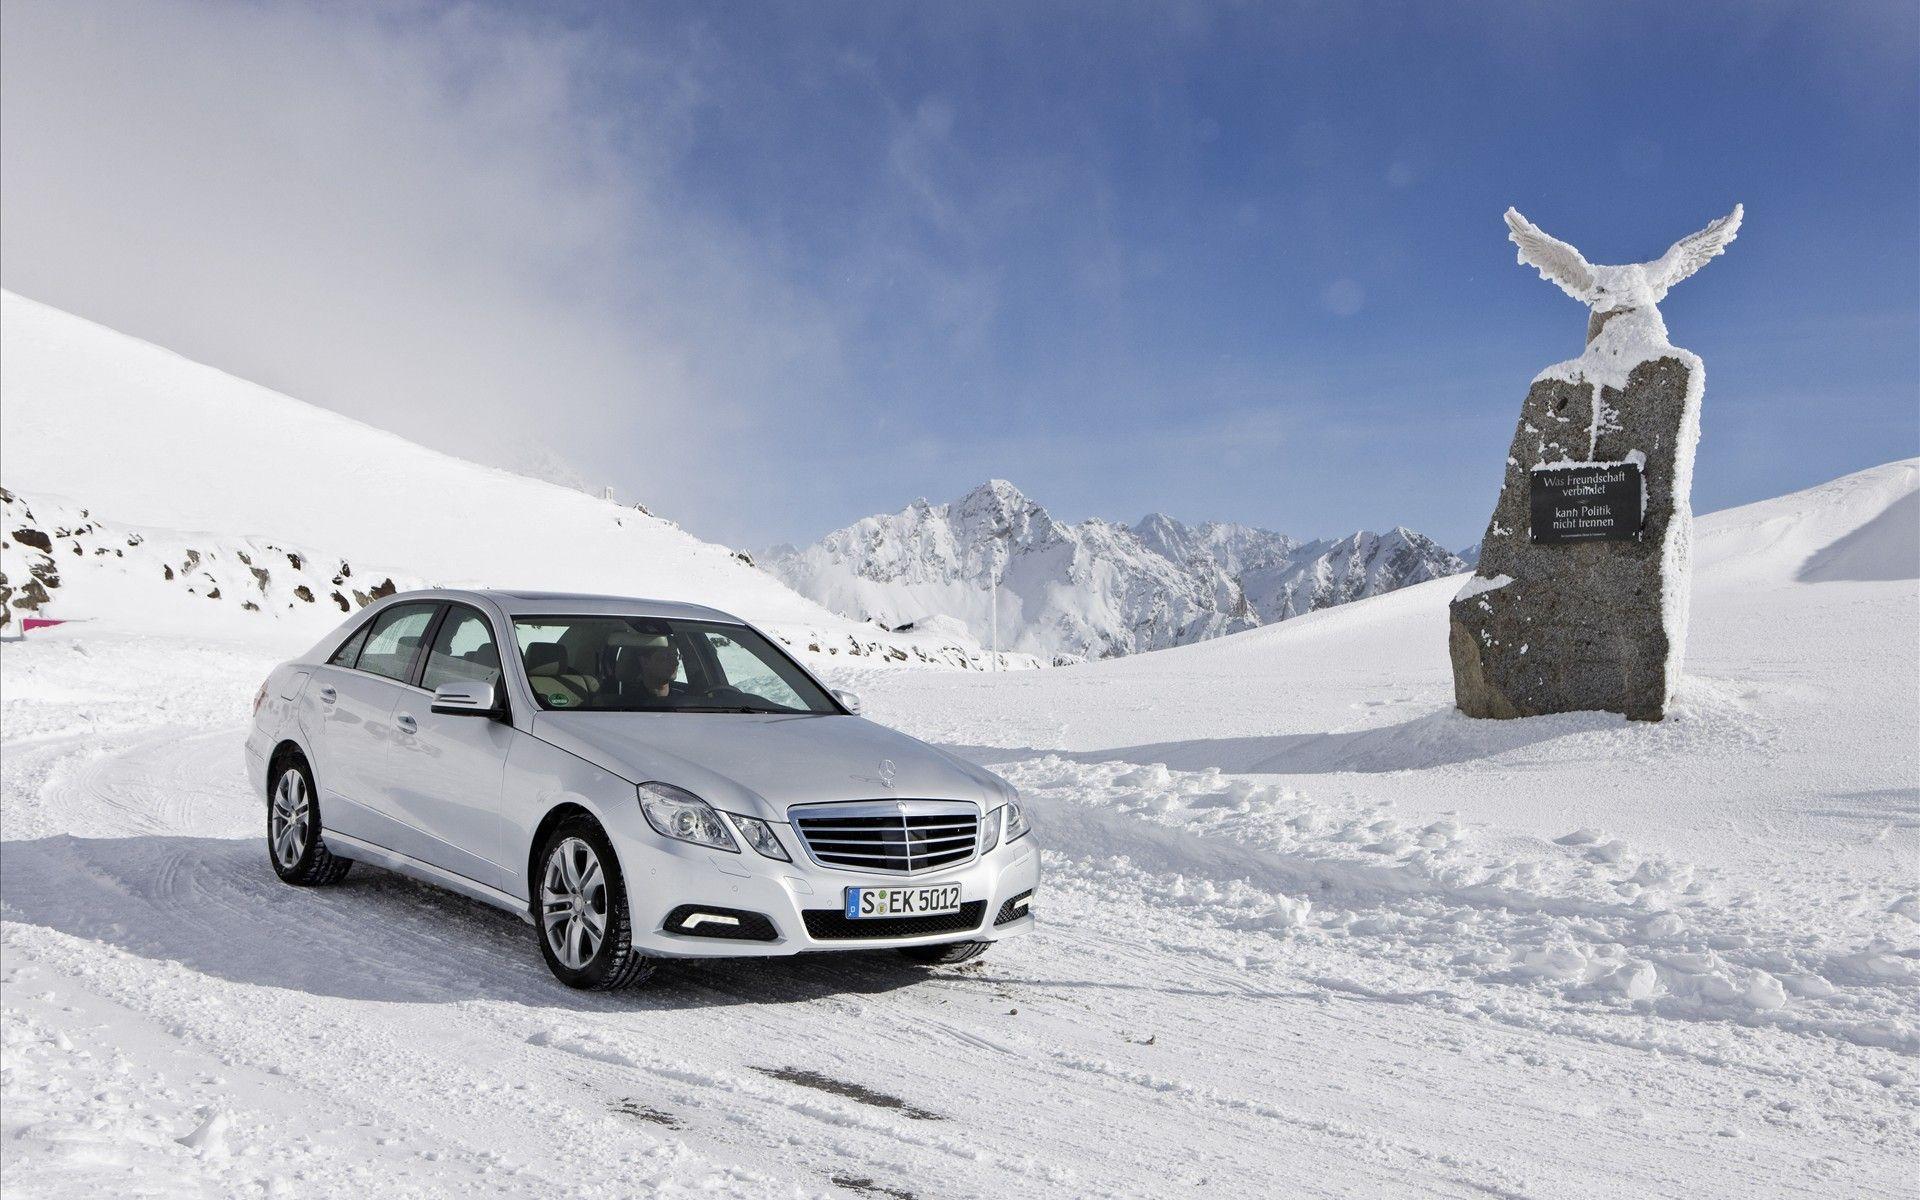 Mercedes Benz Nature Wallpapers Top Free Mercedes Benz